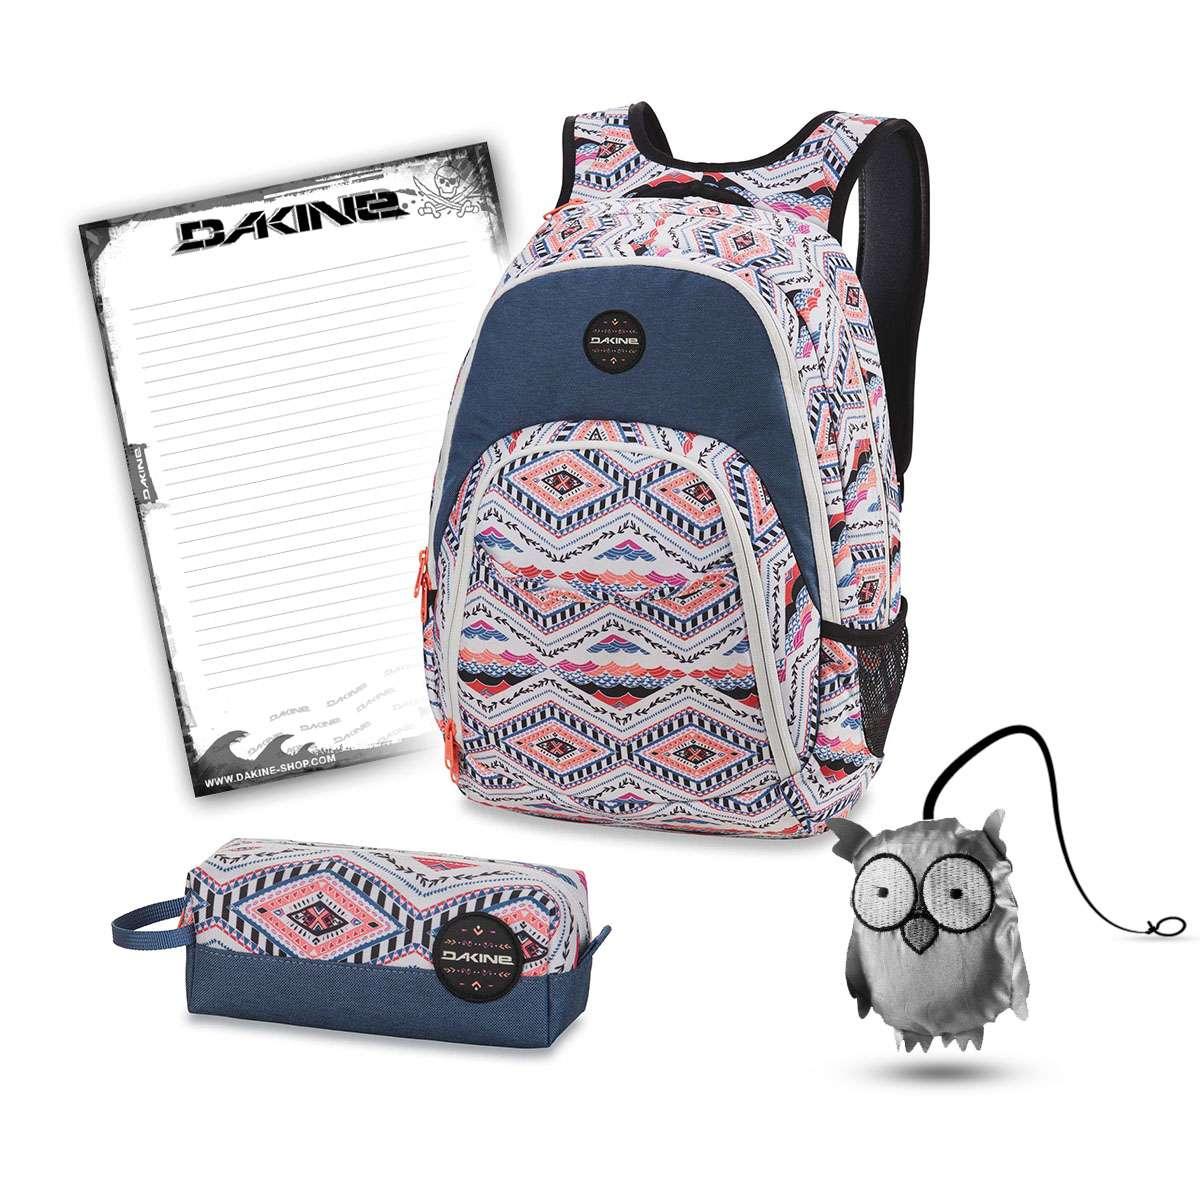 6a7a838ab6fe0 Dakine Eve 28L + Accessory Case + Emma + Notepad School Set Lizzy ...